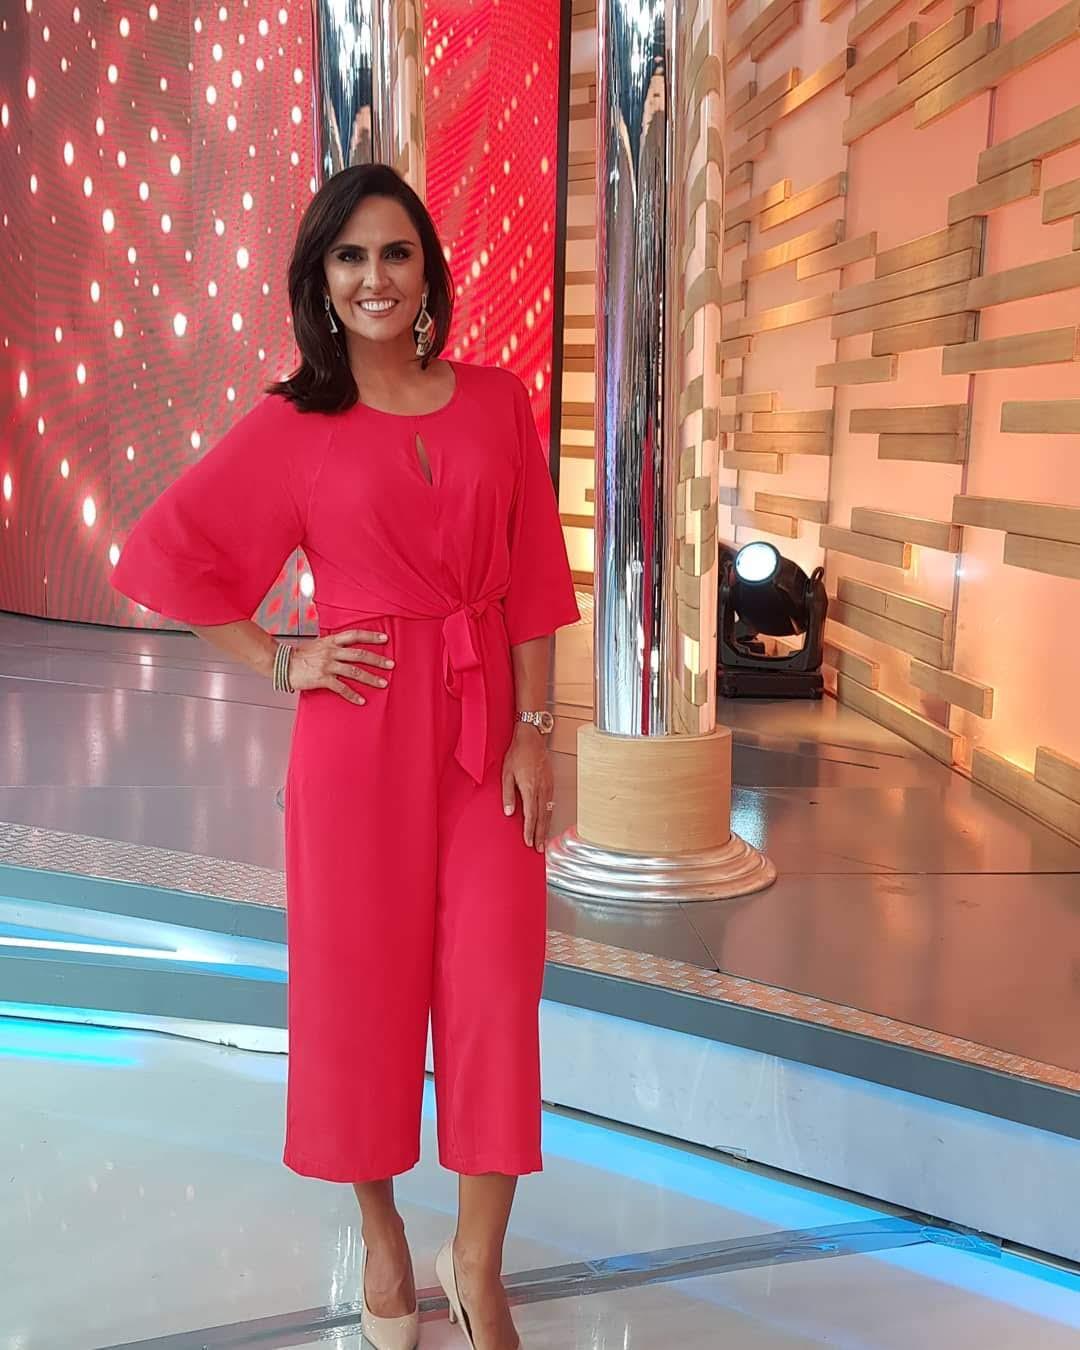 Jornalista Carla Cecato participa do Hora do Faro deste domingo (28)